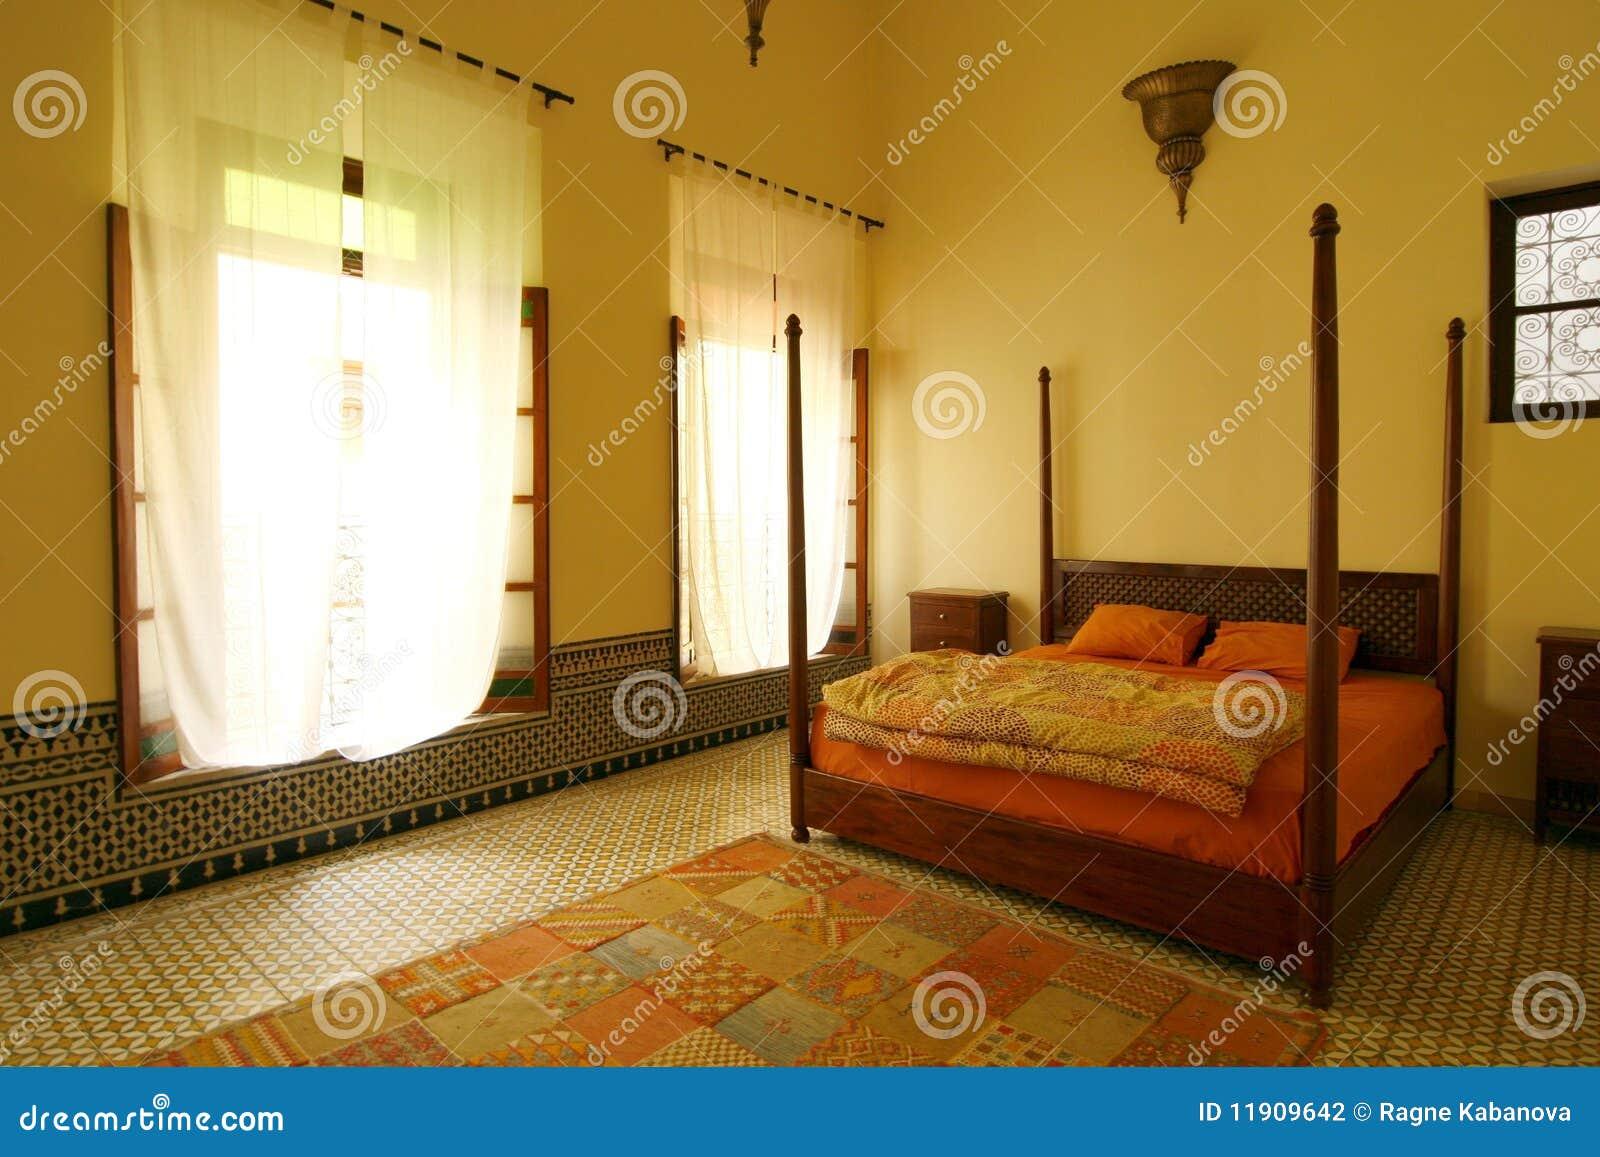 Belle Chambre Coucher Arabe Authentique Maroc Photographie Stock Image 11909642